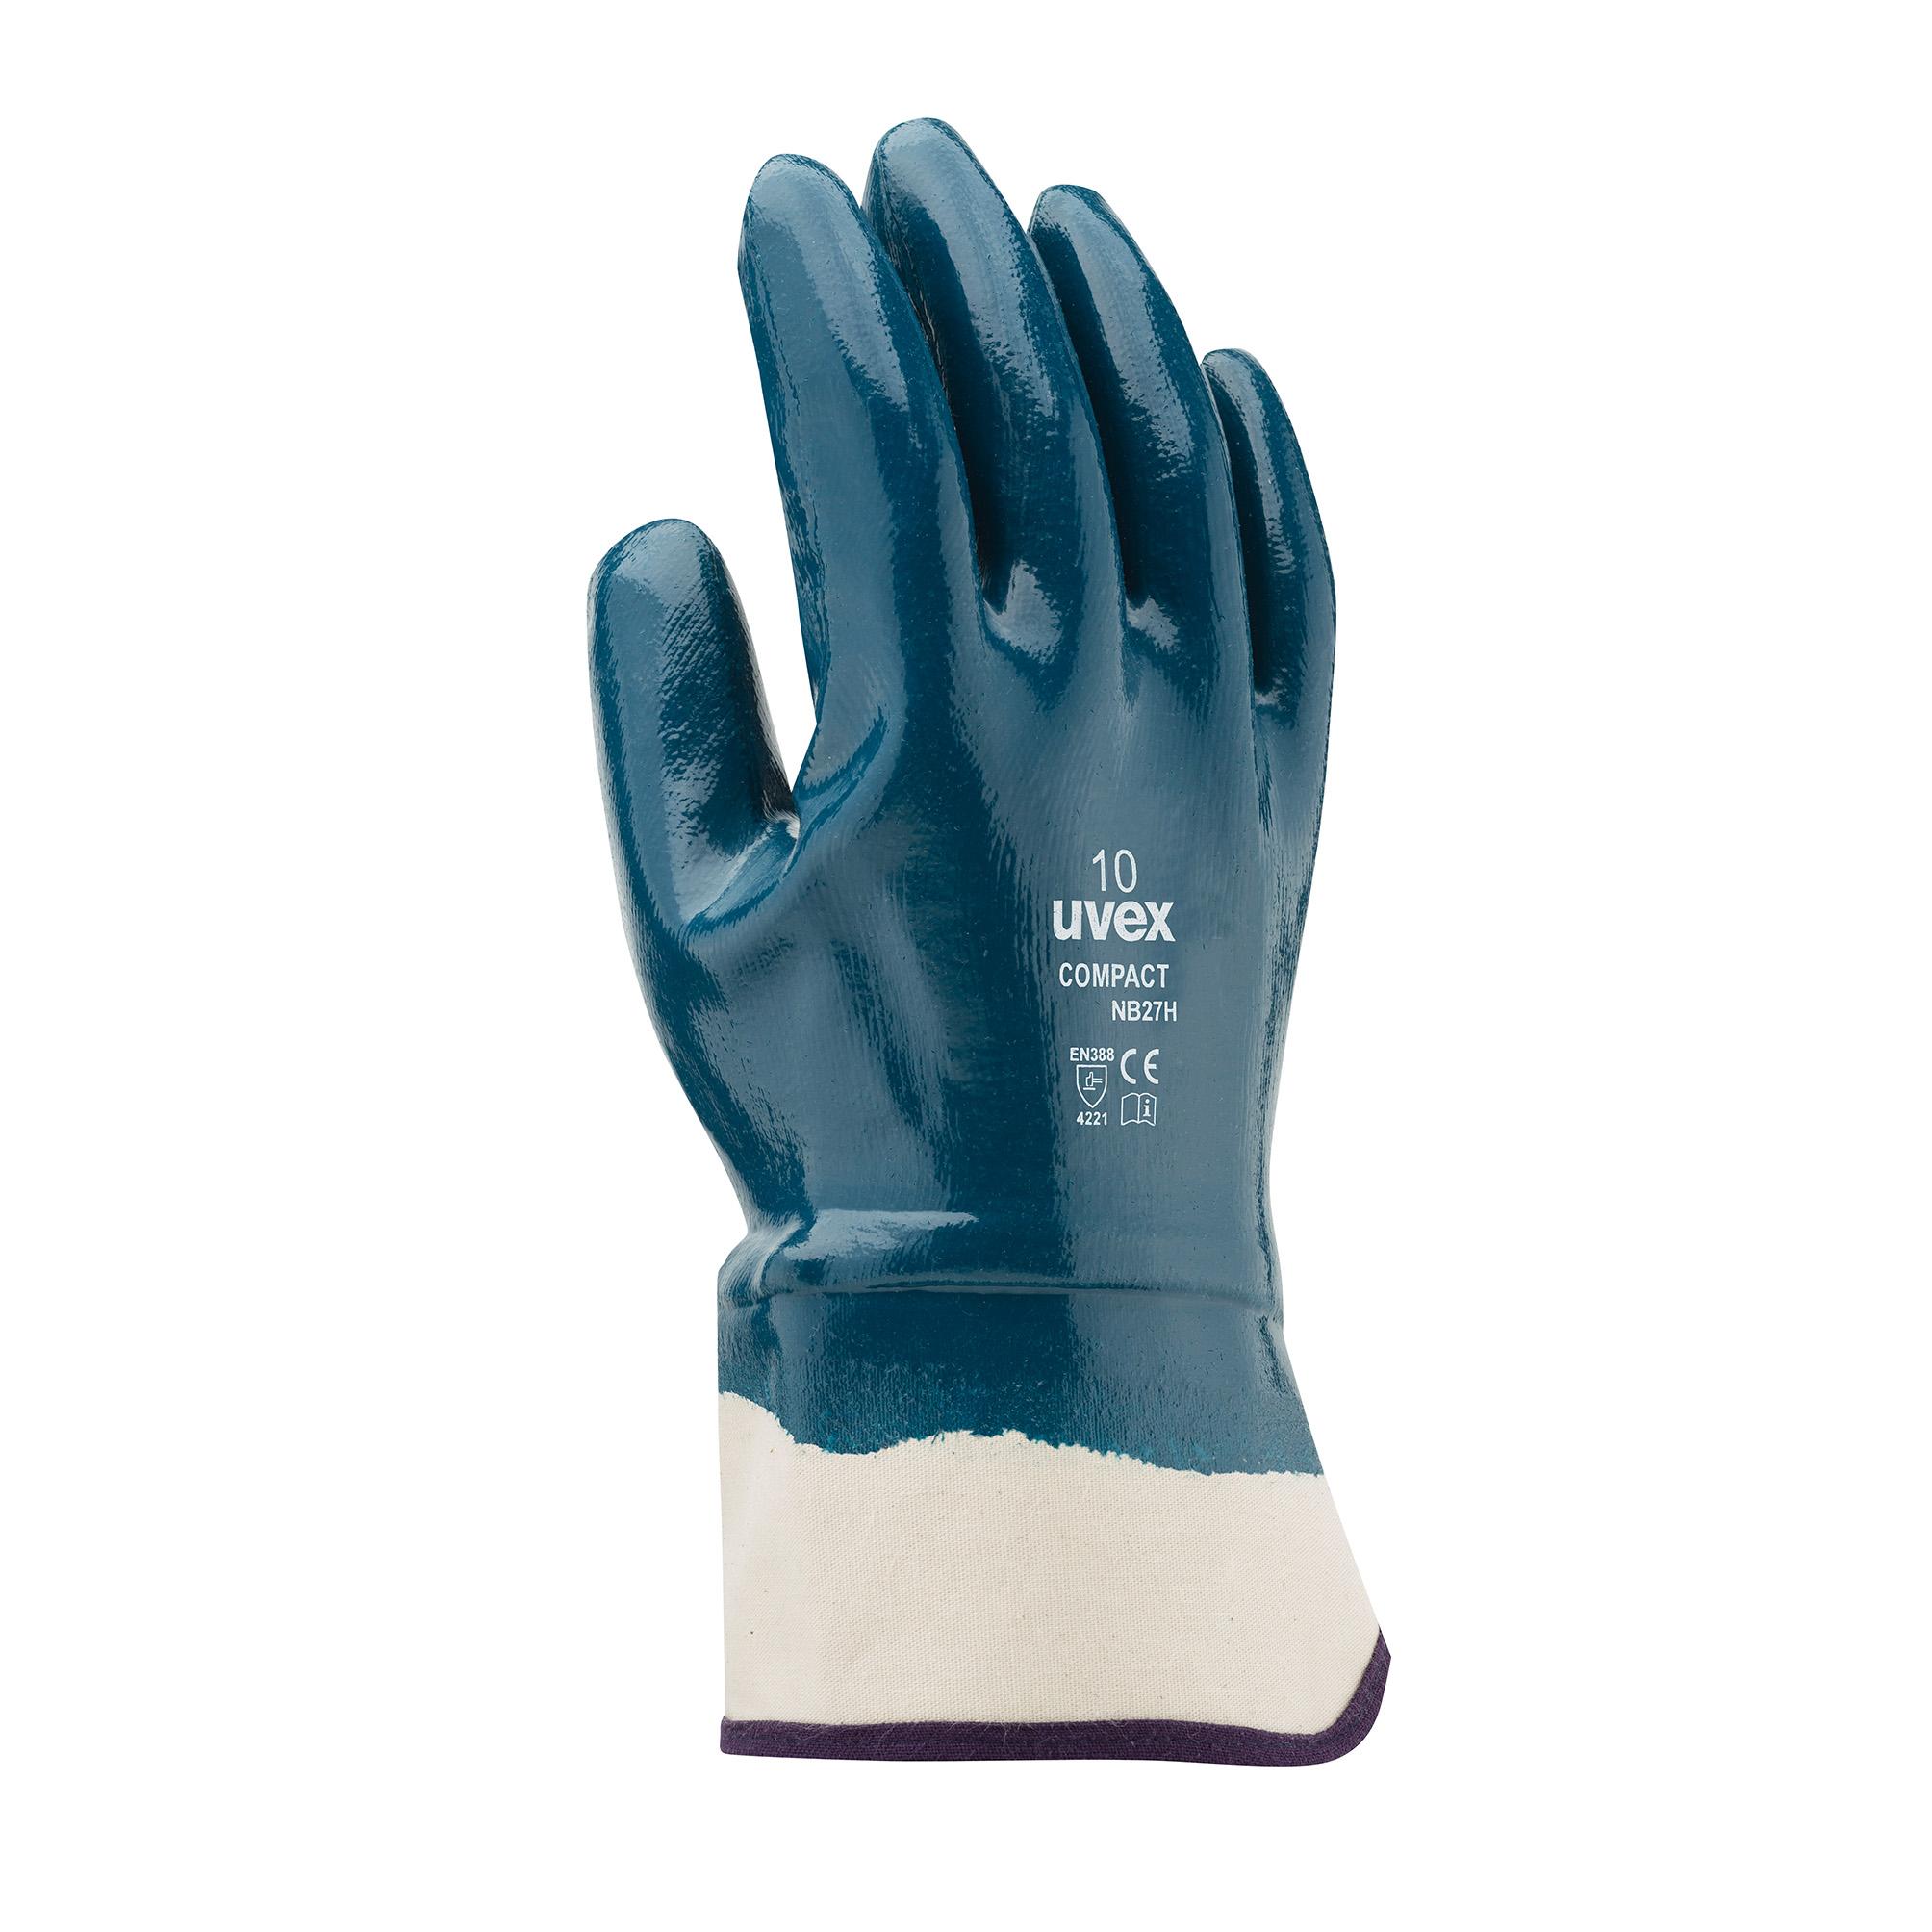 Uvex Compact Nb27h Safety Glove Safety Gloves Uvex Safety